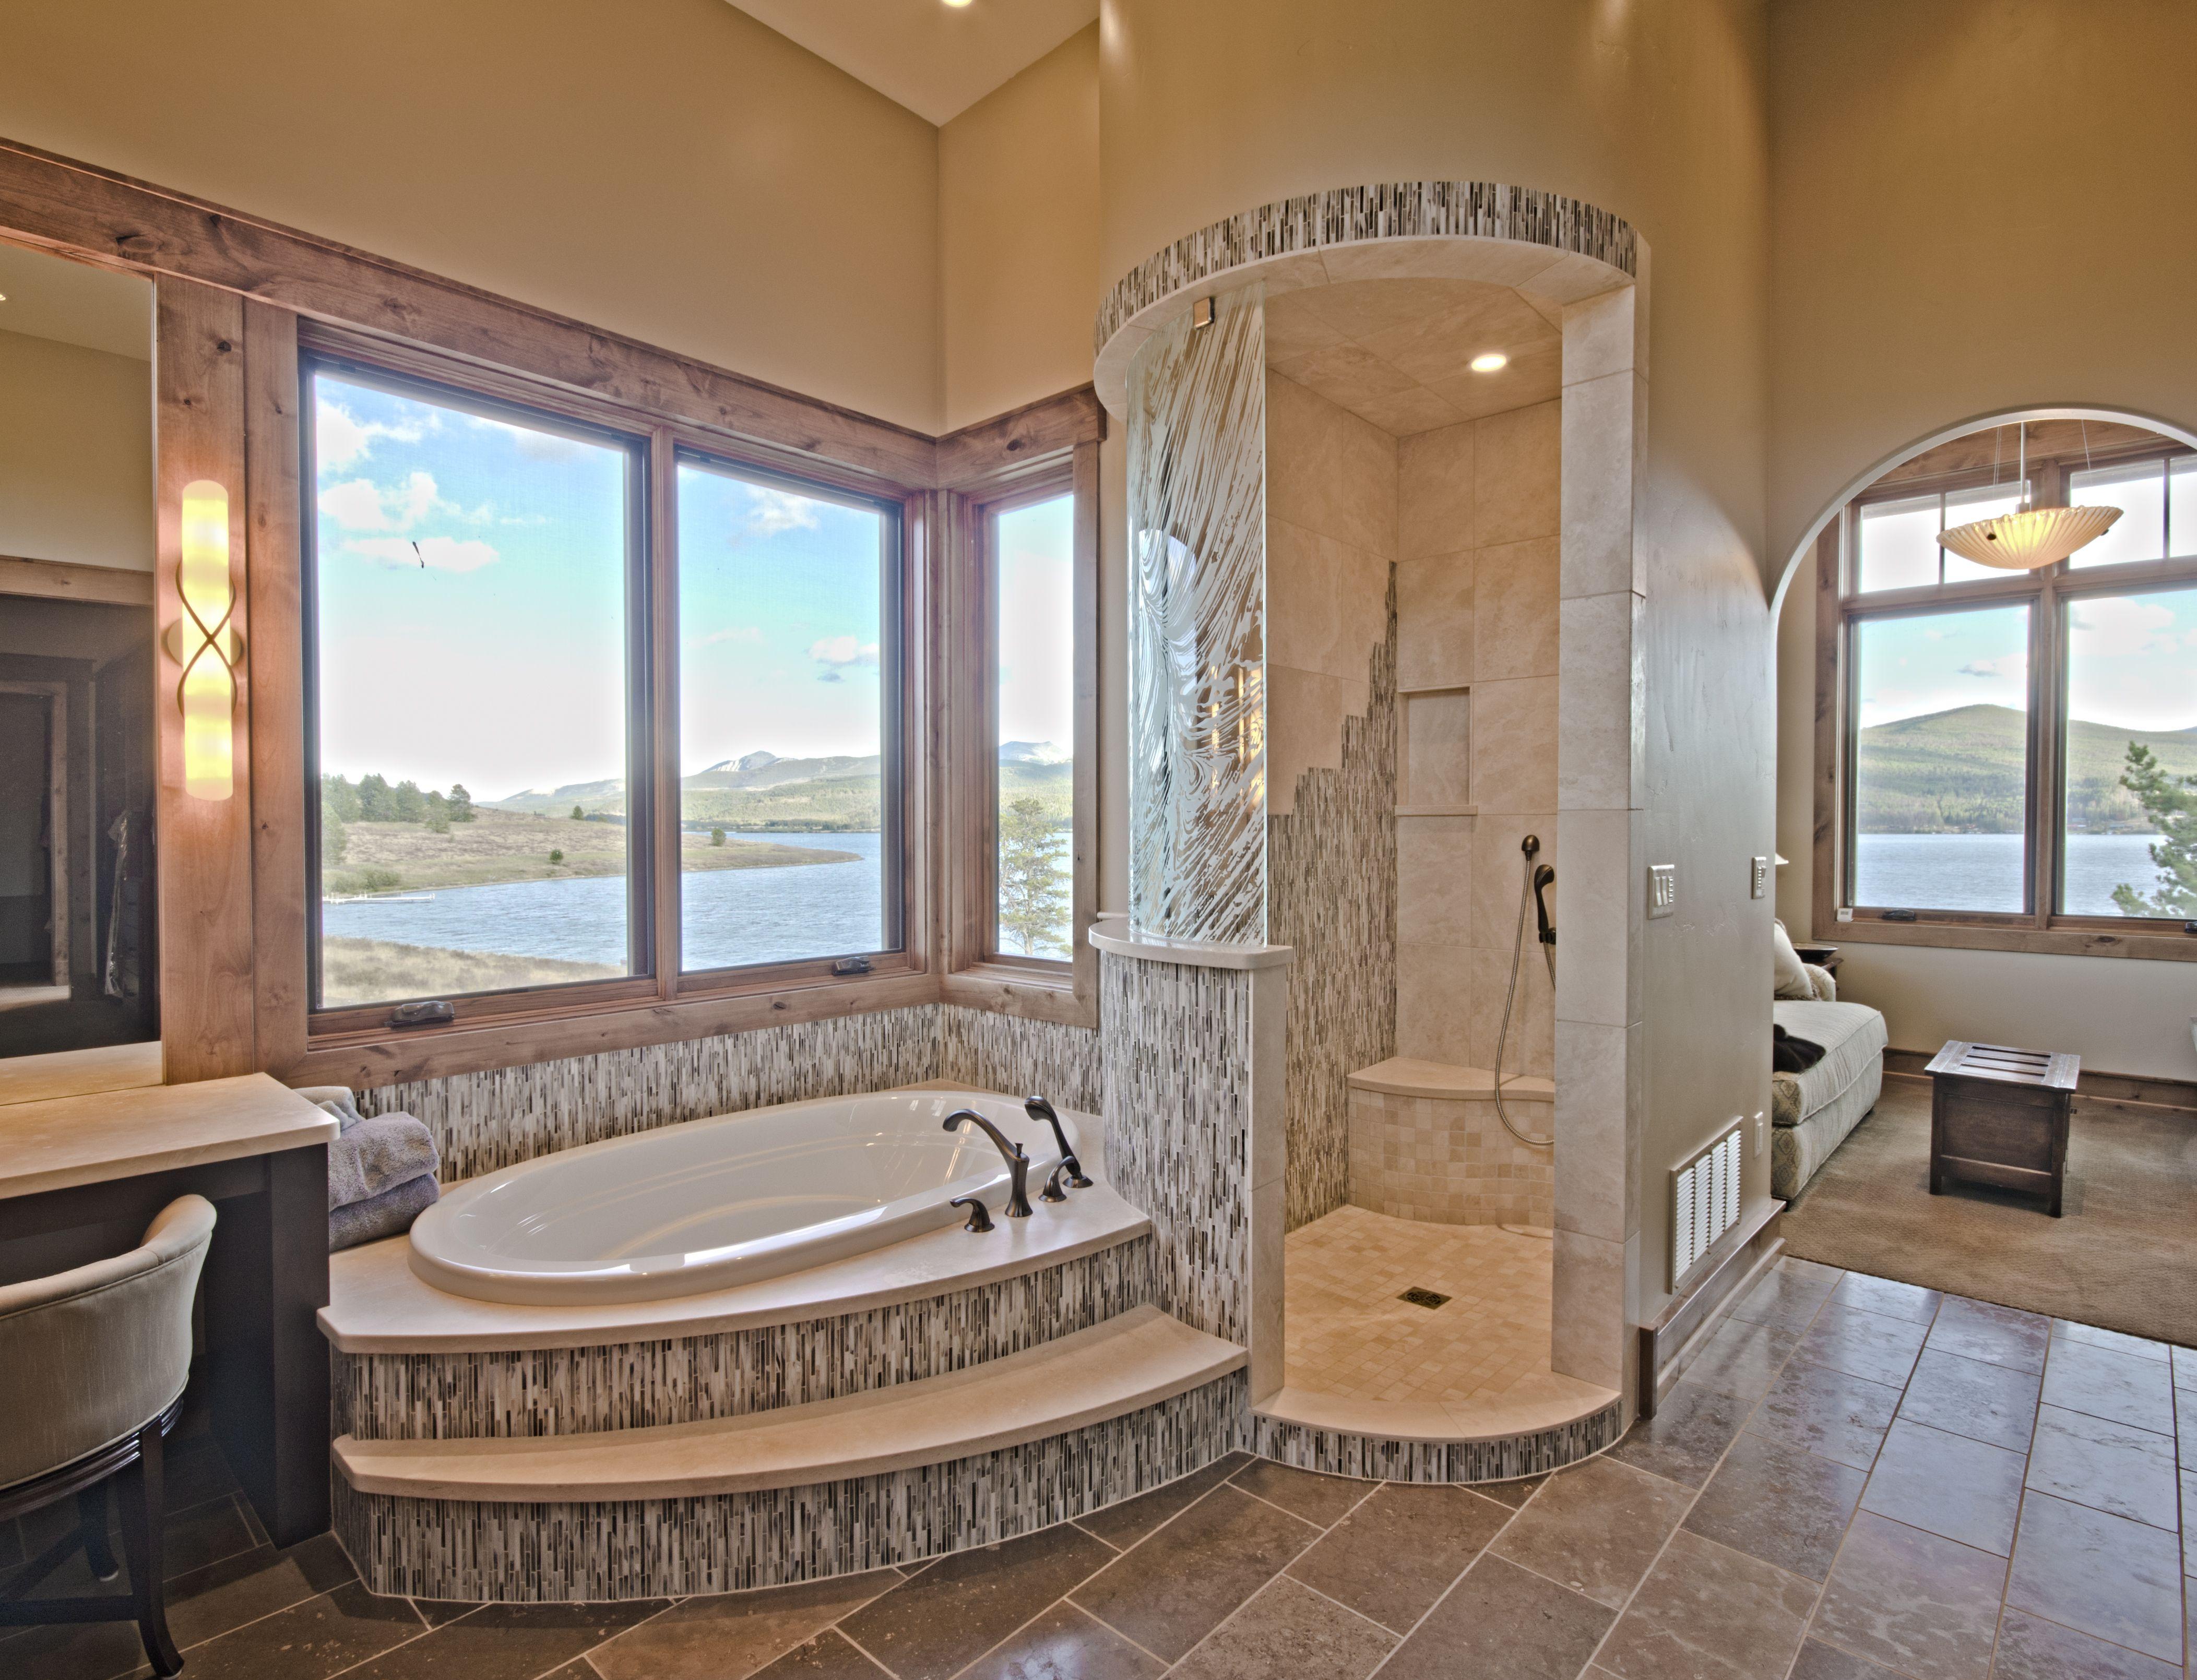 Modern Master Bathroom Tile Ideas: Shower AND Bath Tub In This Modern Bathroom. Another